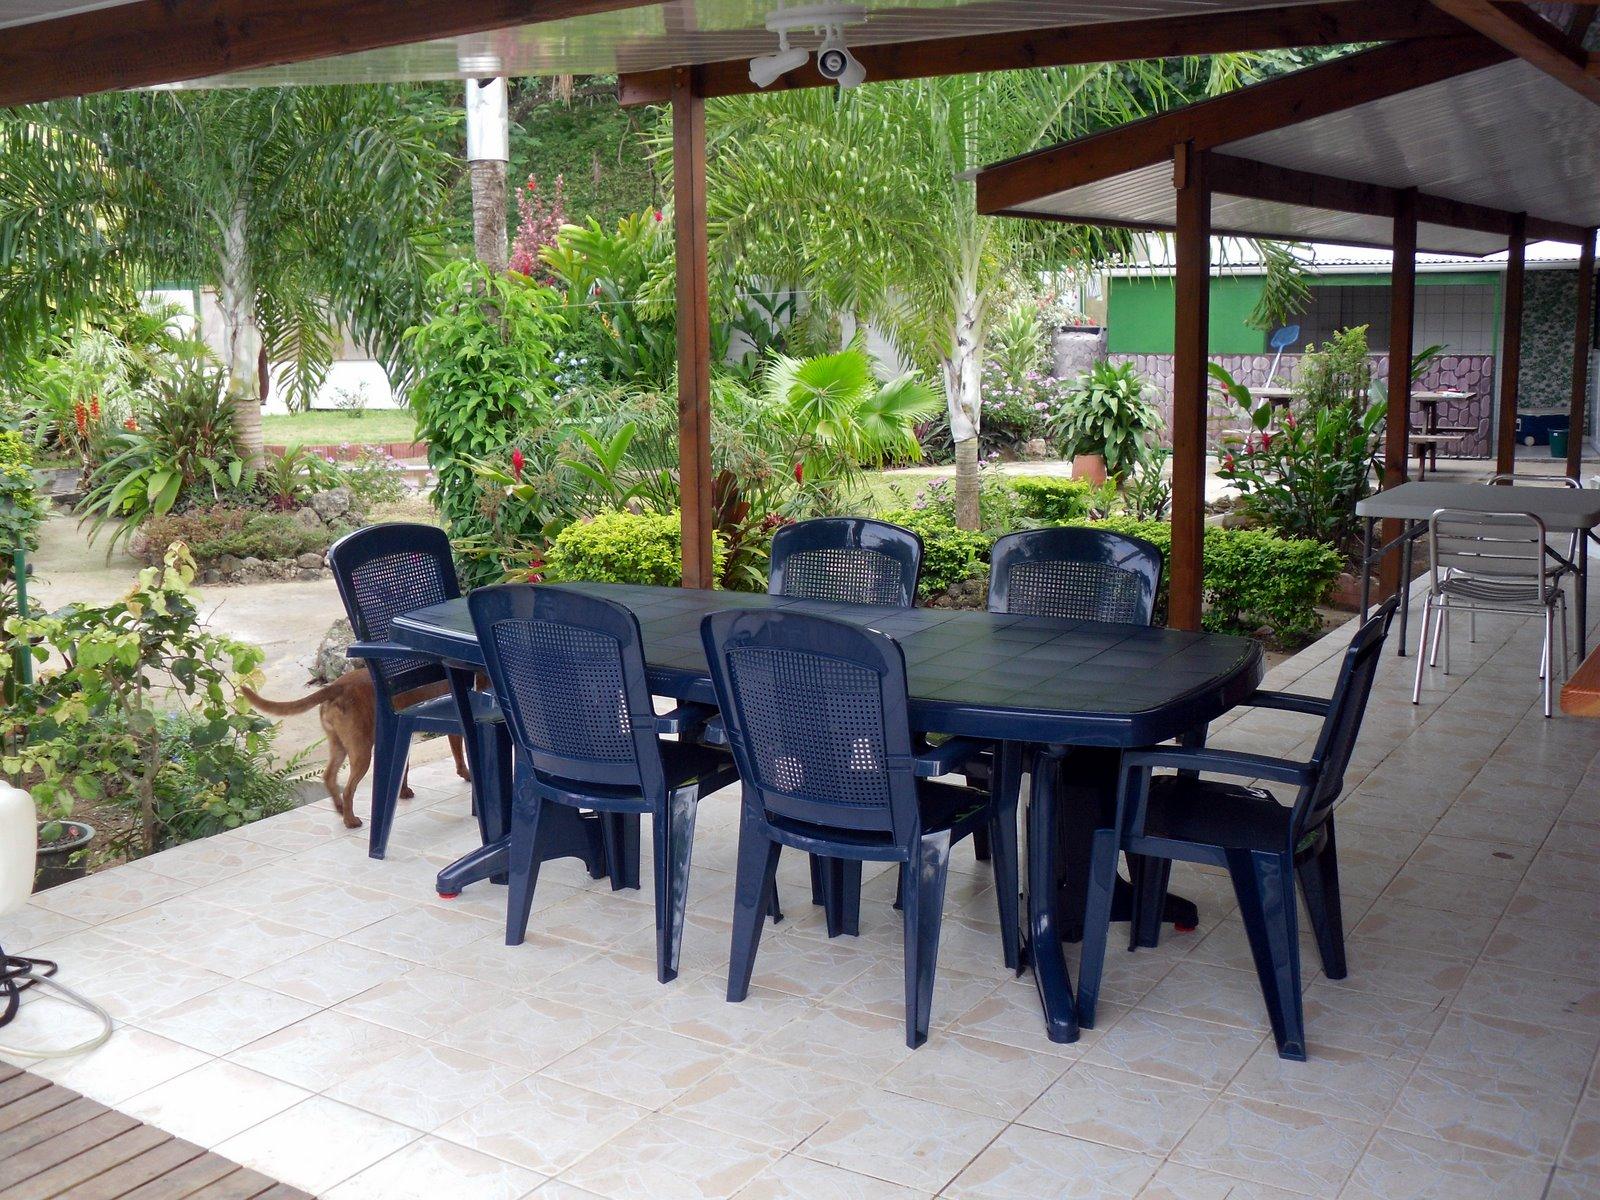 vaianae village moorea pk 21 5 mer cuisine quip e. Black Bedroom Furniture Sets. Home Design Ideas